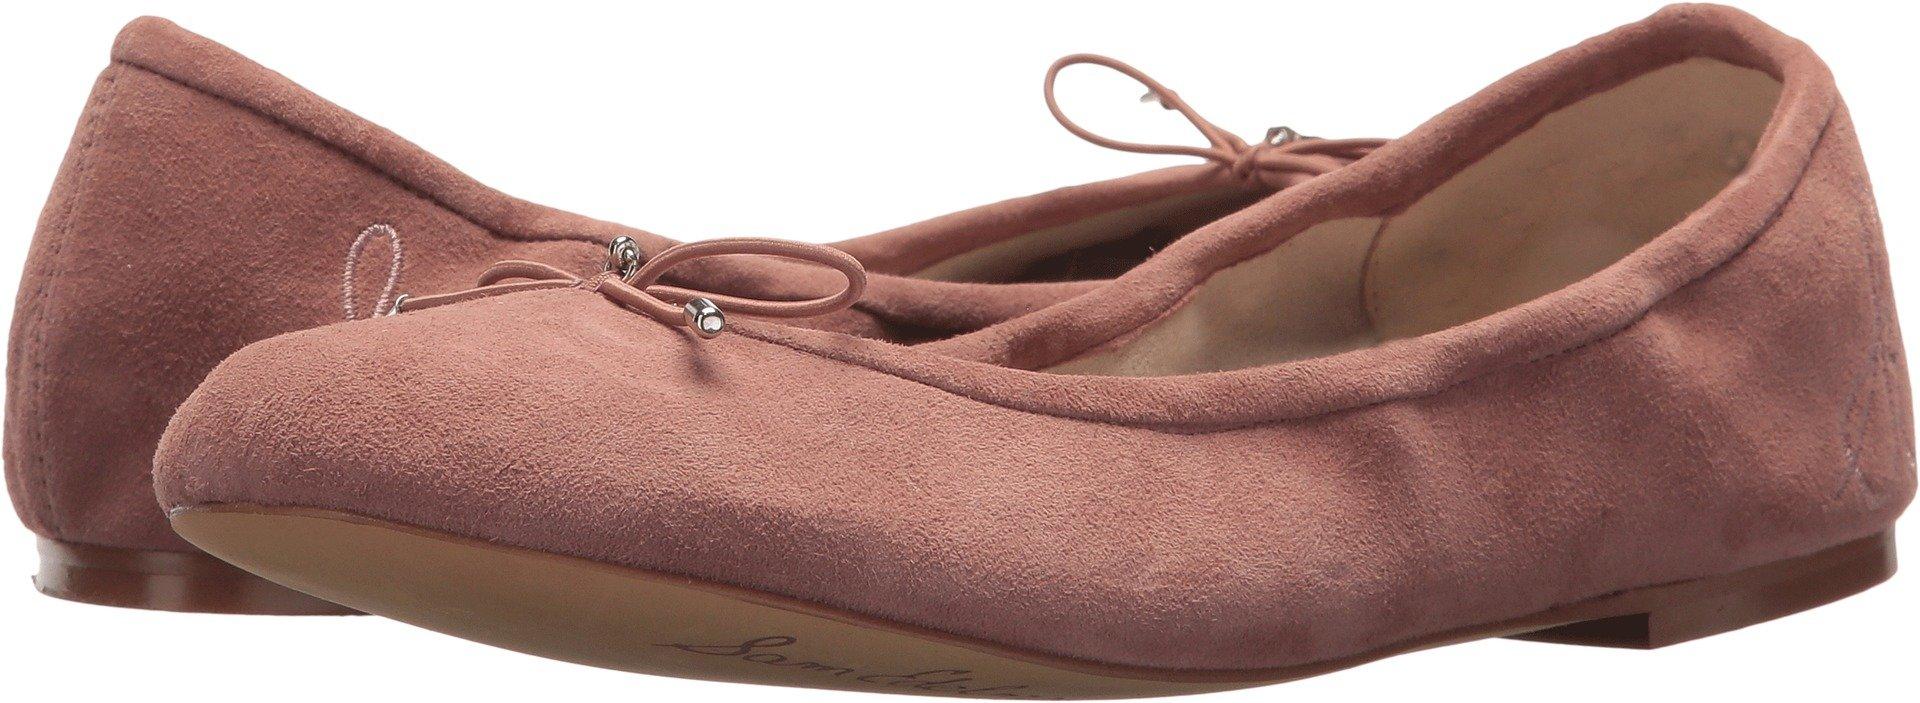 Sam Edelman Women's Felicia Dusty Rose Kid Suede Leather 10.5 M US